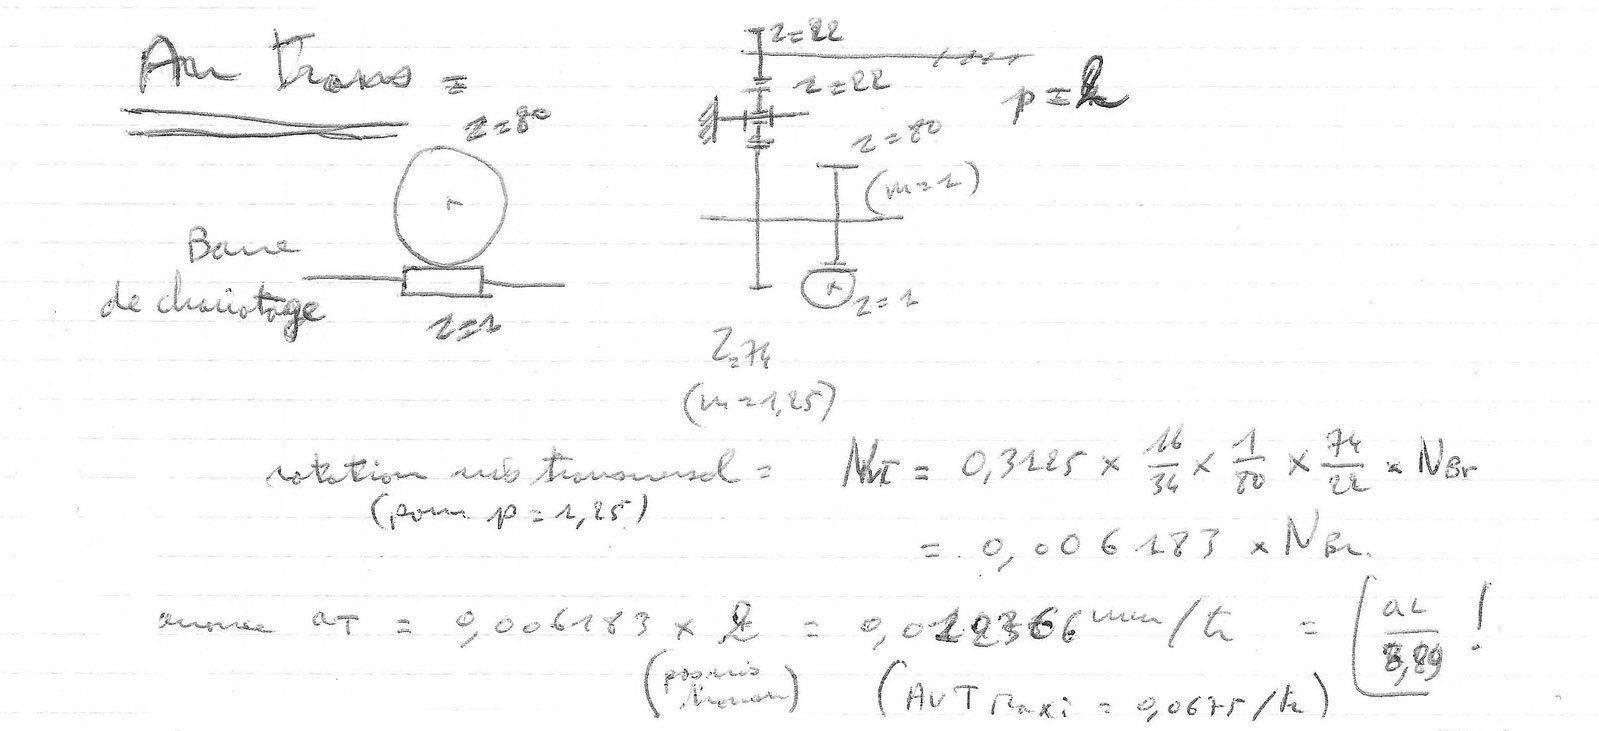 chaine ciné avance  transversale Latimier LW130.jpg